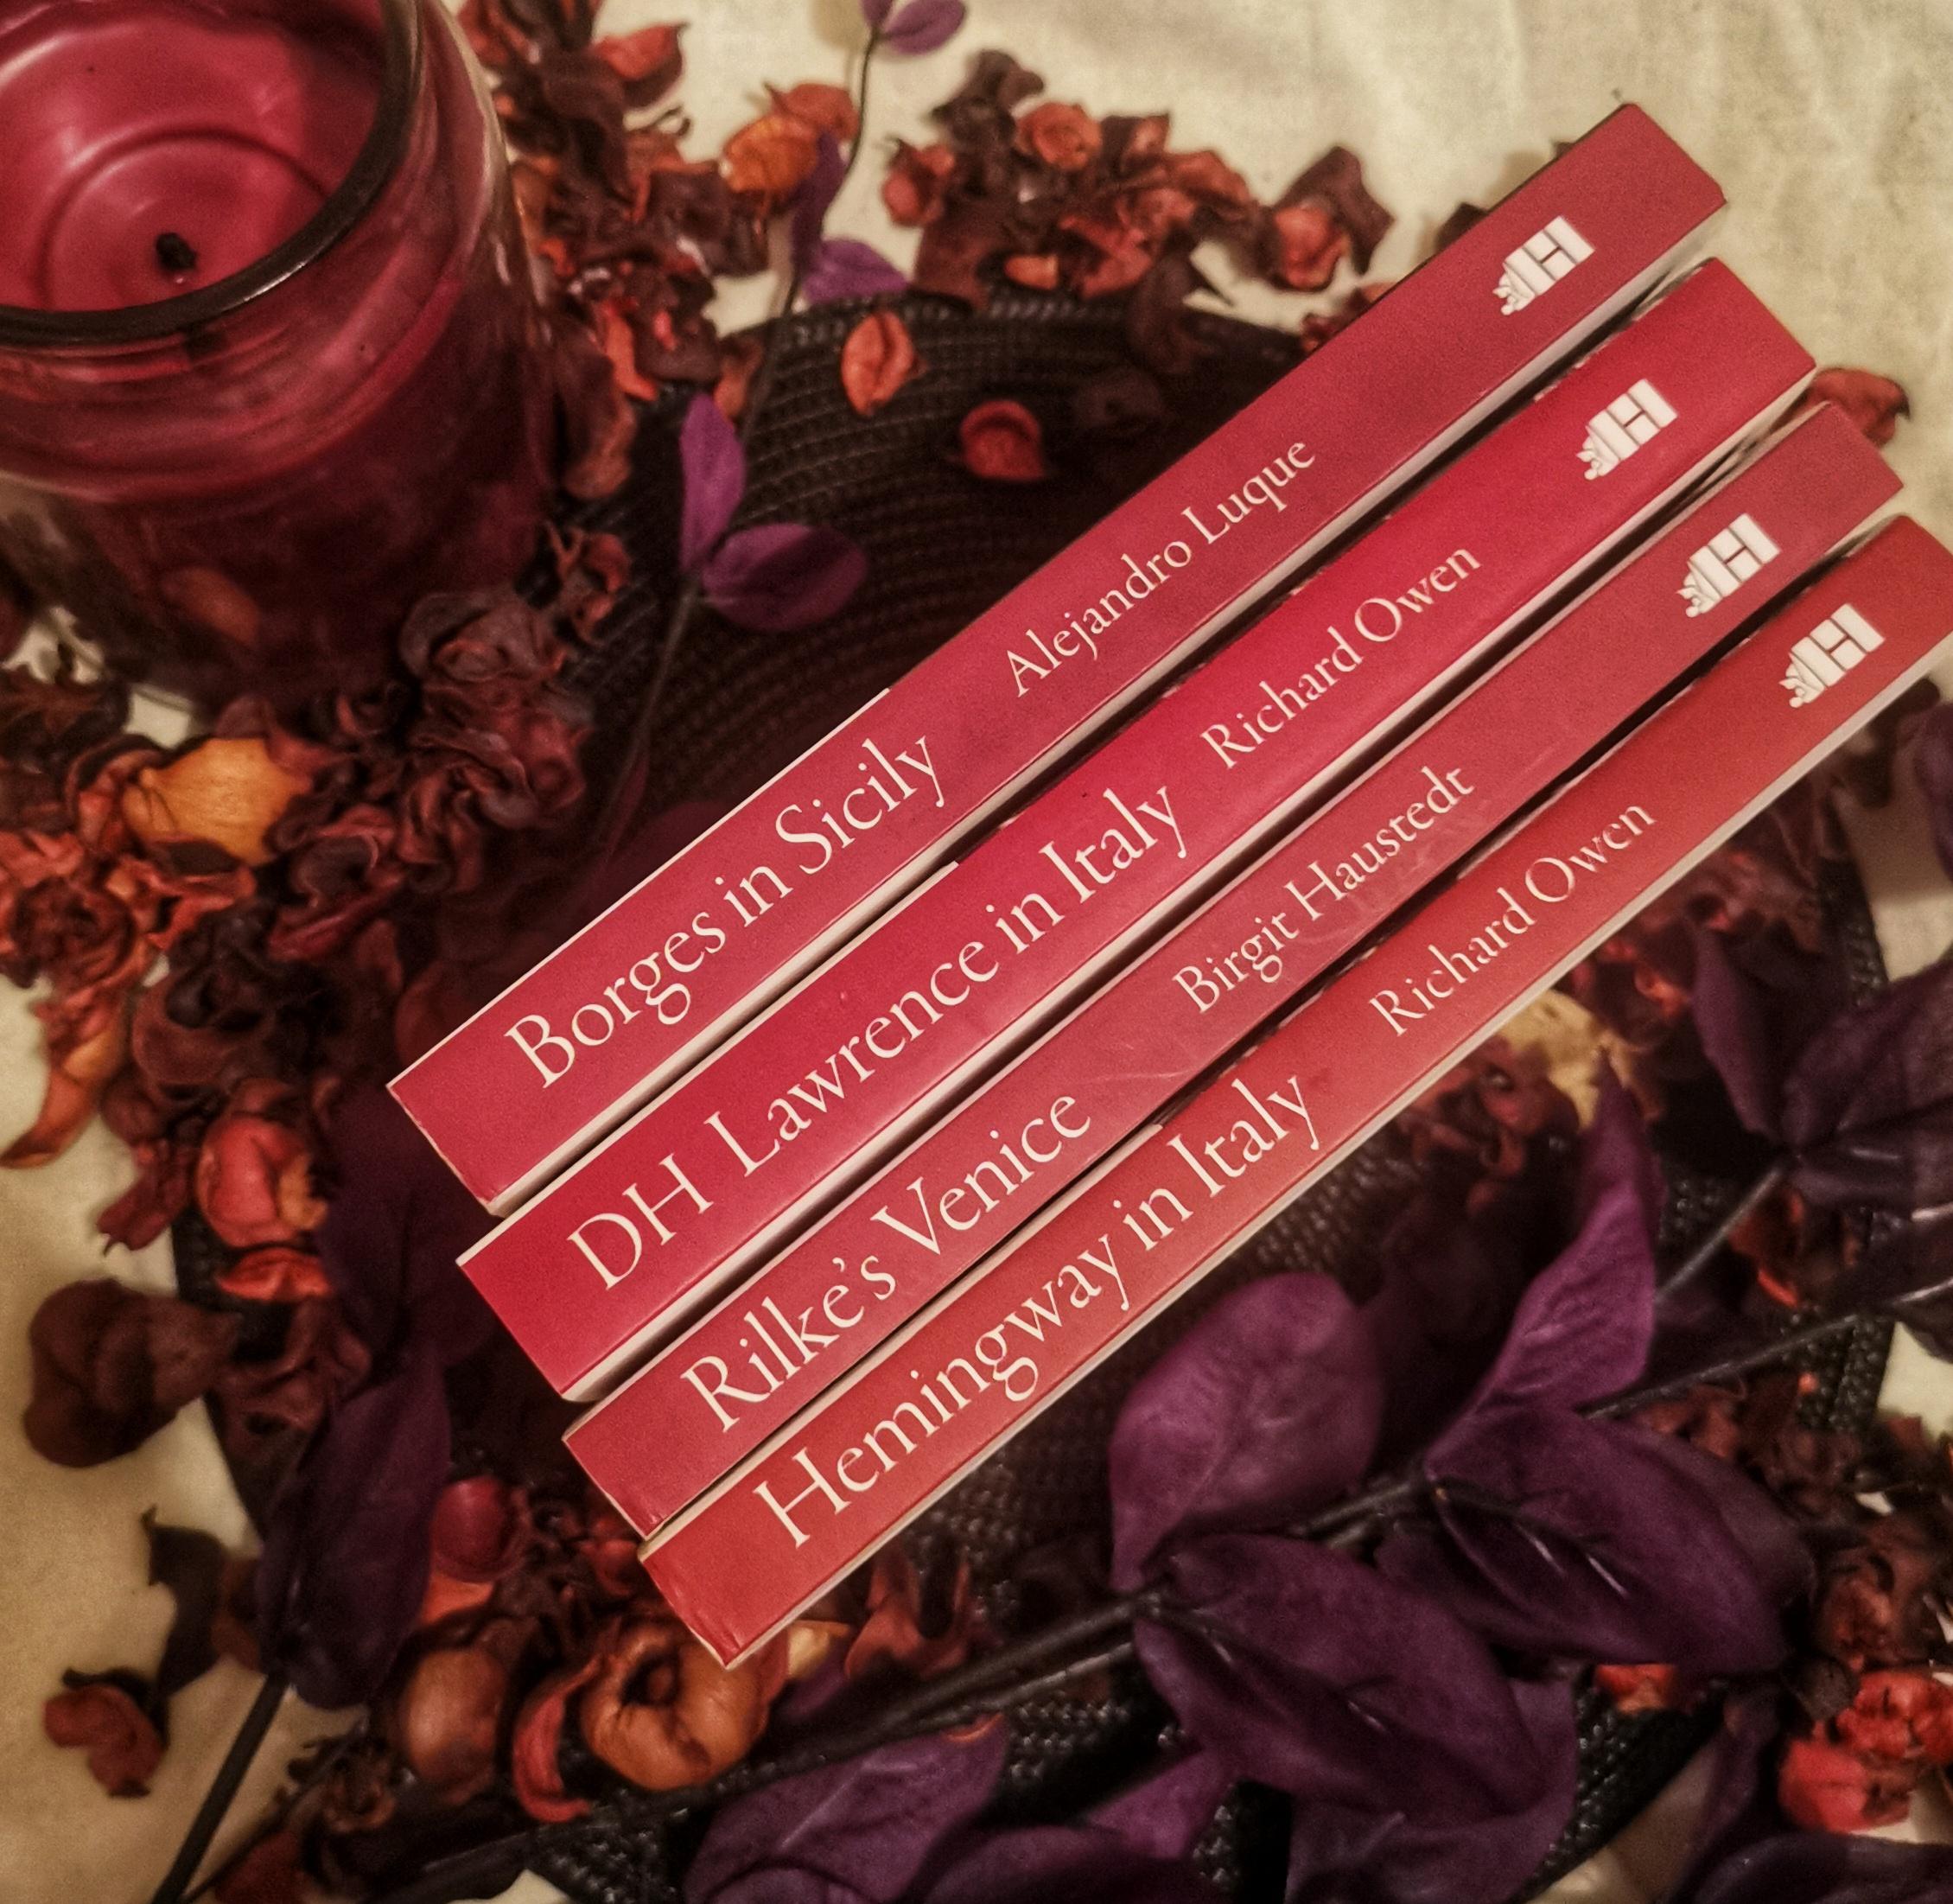 Haus Publishing Italian Armchair travelling series